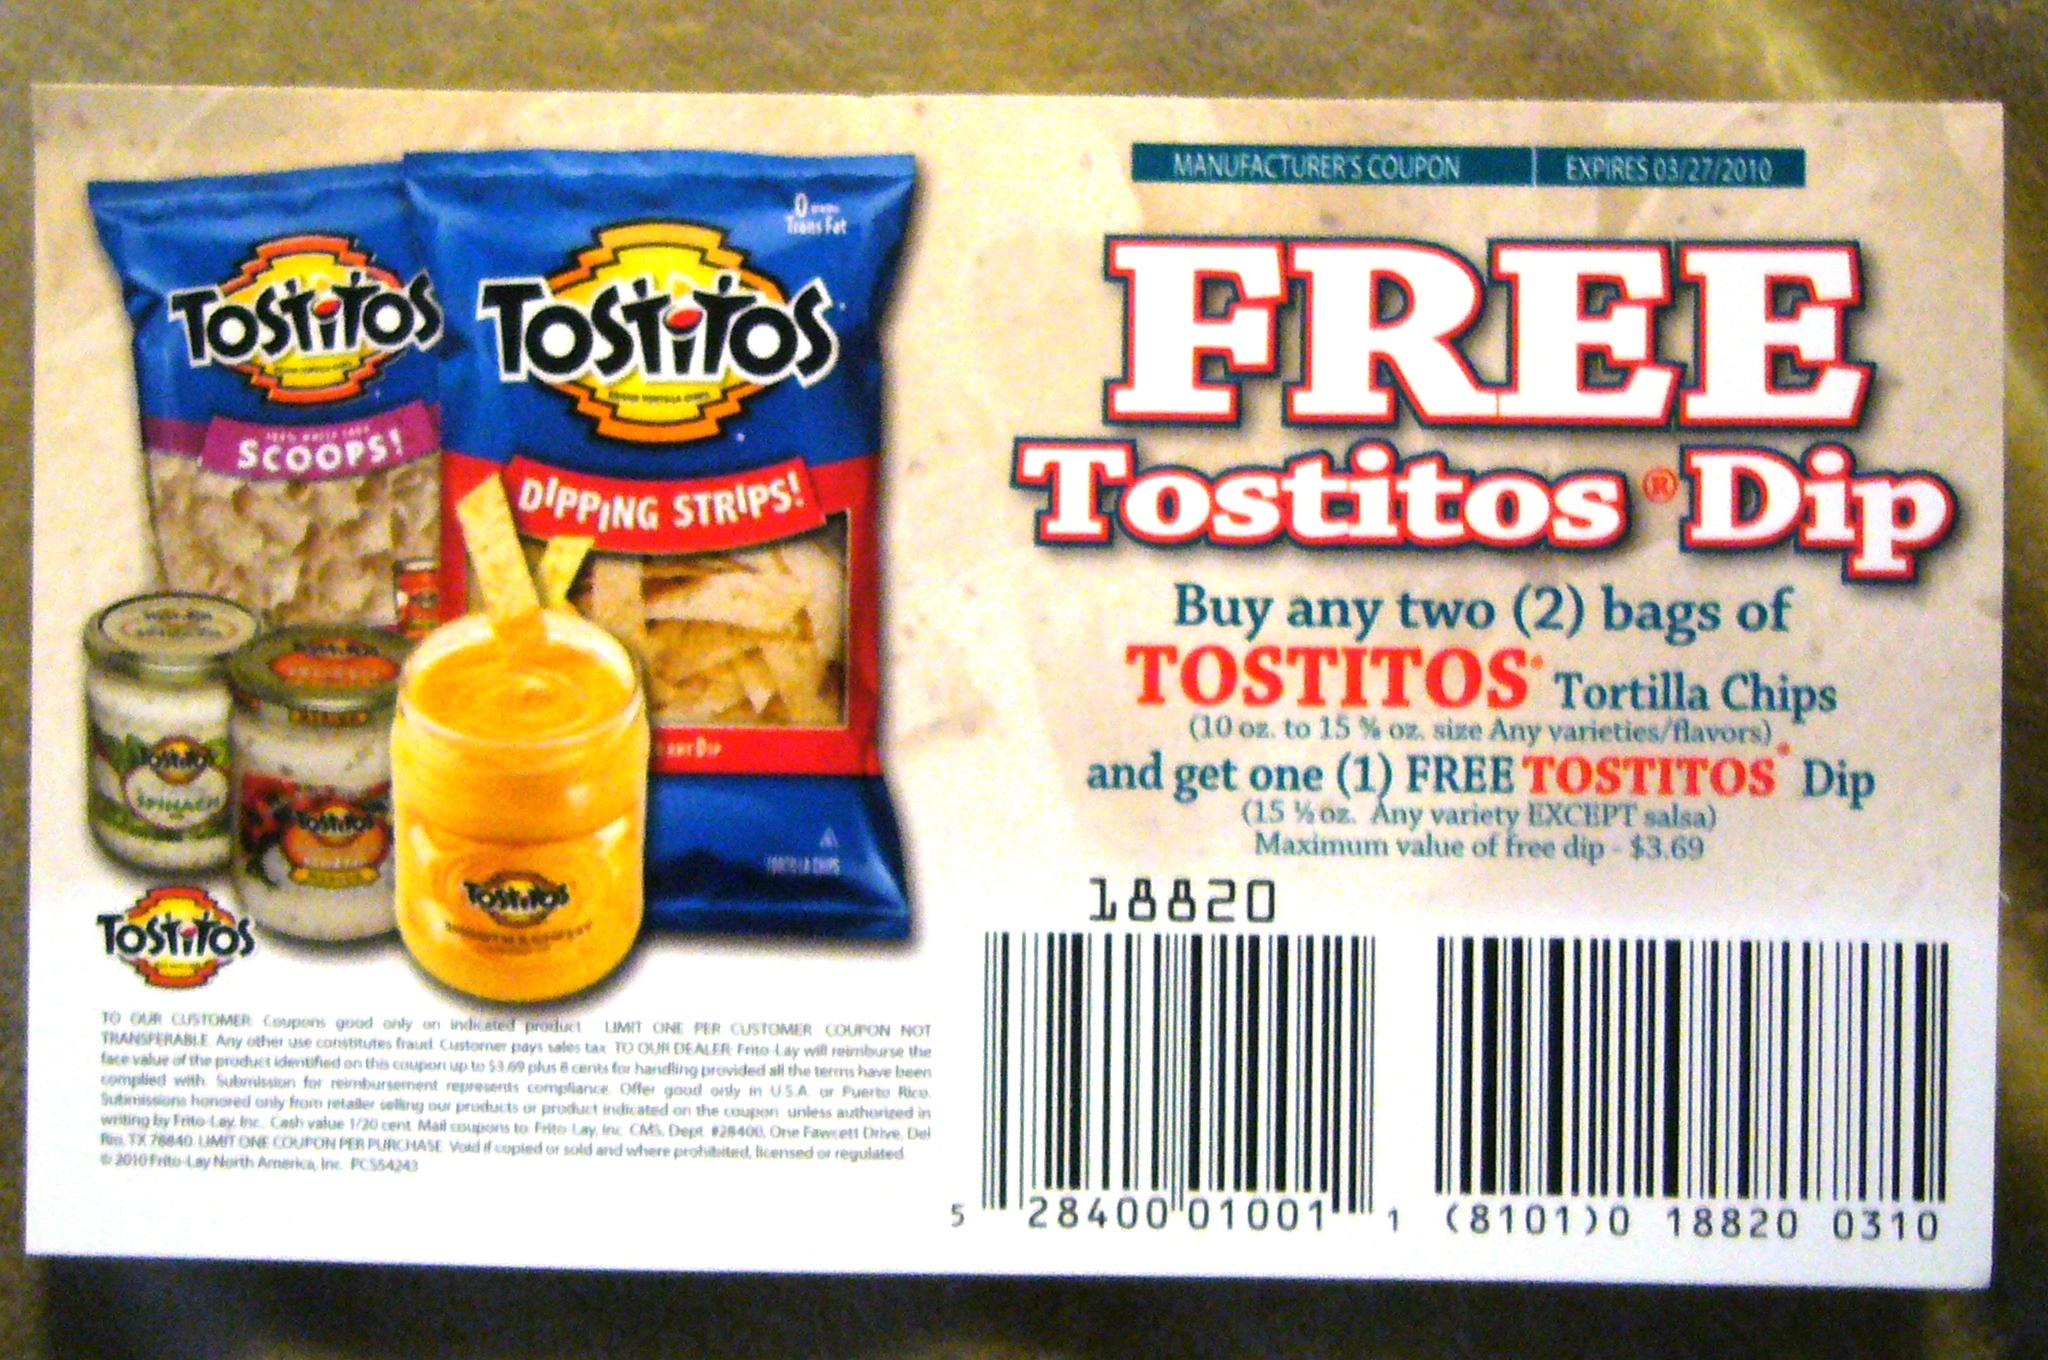 Tostitos Salsa Coupon 2018 / Discount Coupon New York Pass - Free Printable Frito Lay Coupons